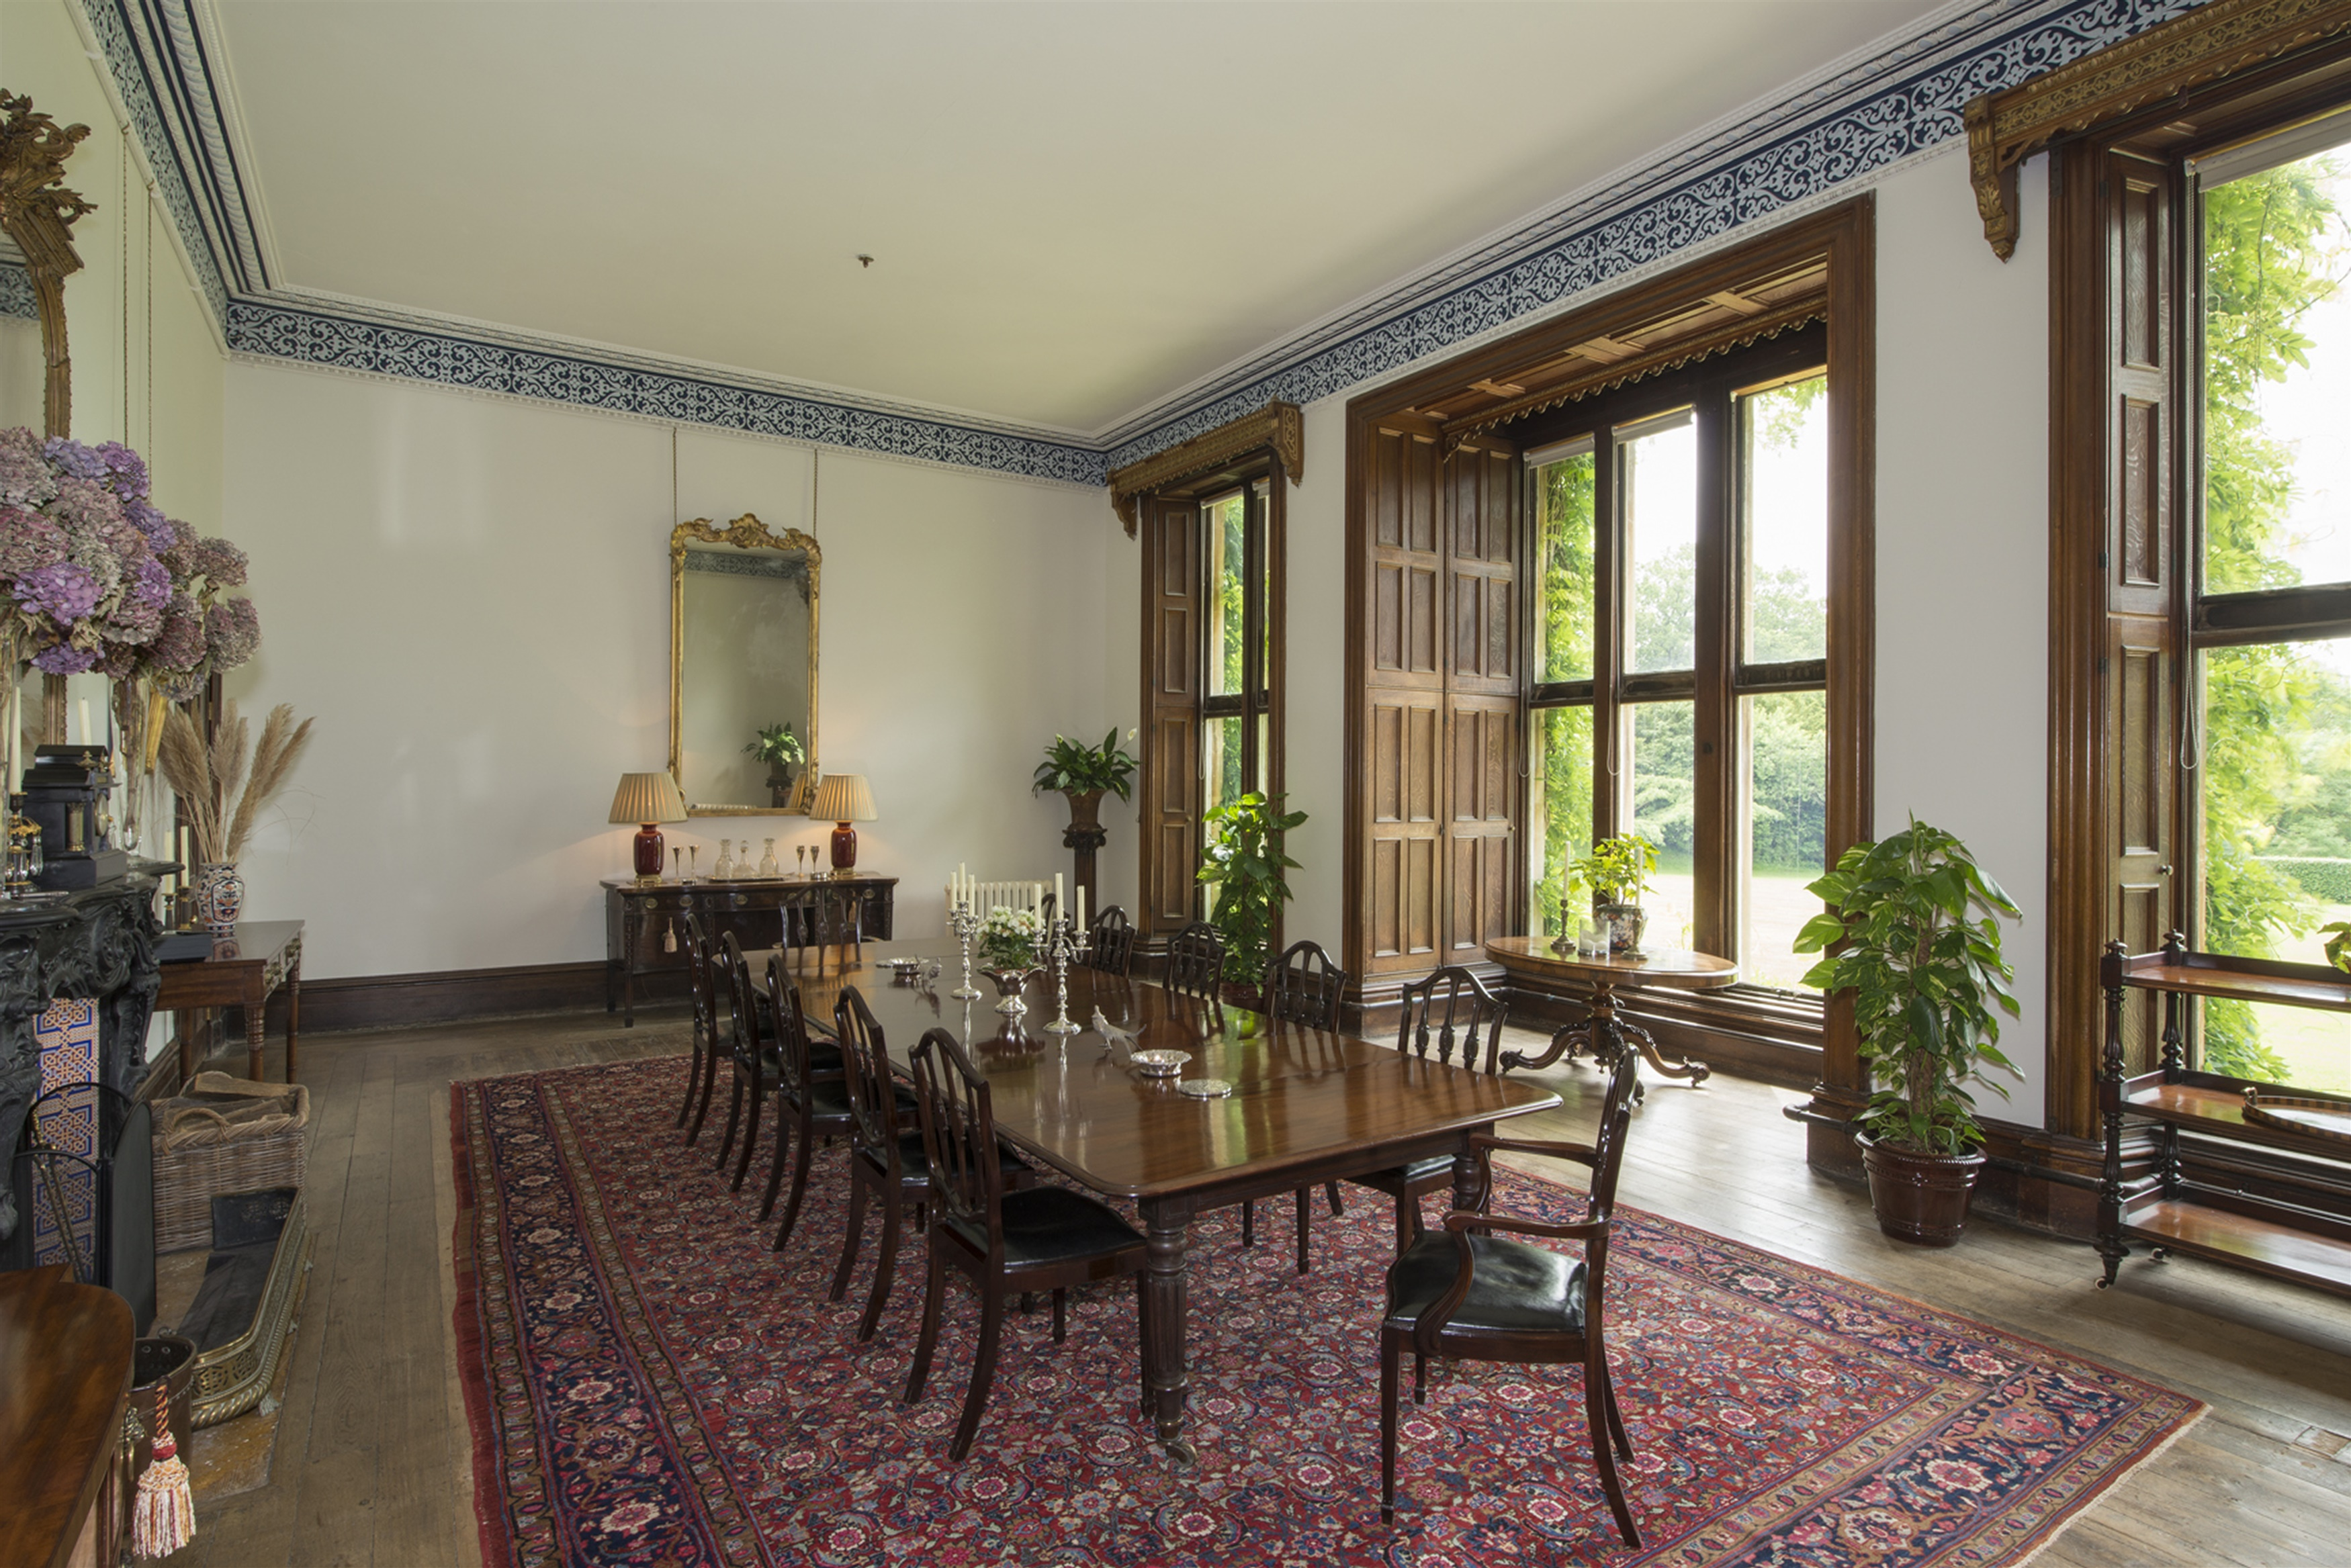 Alderley House Dining Room